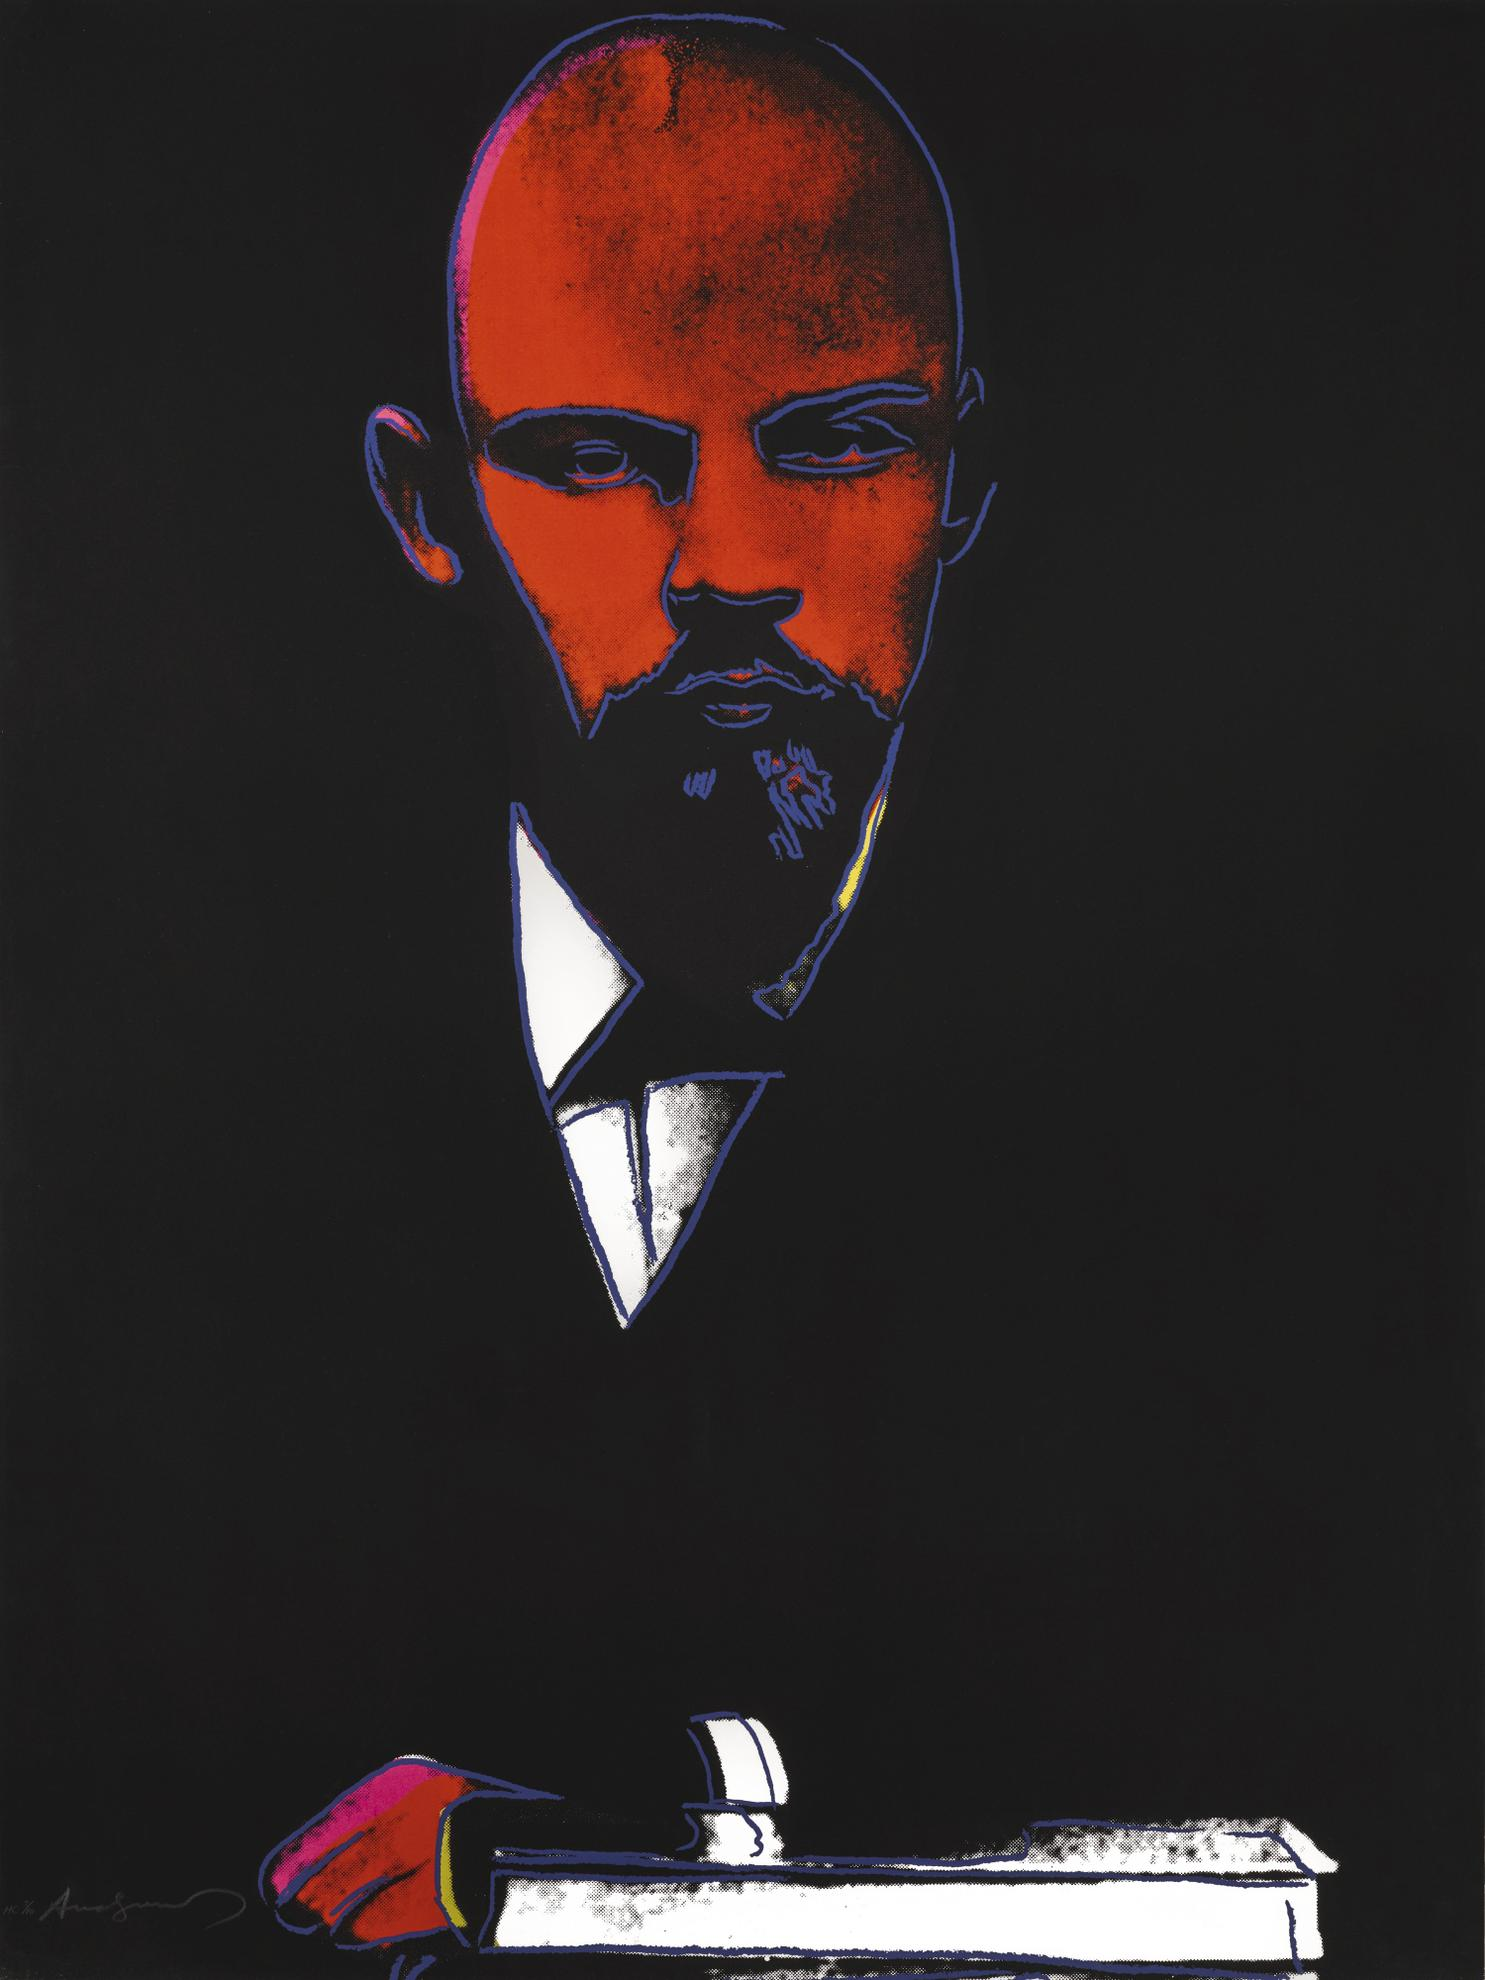 Andy Warhol-Lenin (F. & S. II.402)-1987